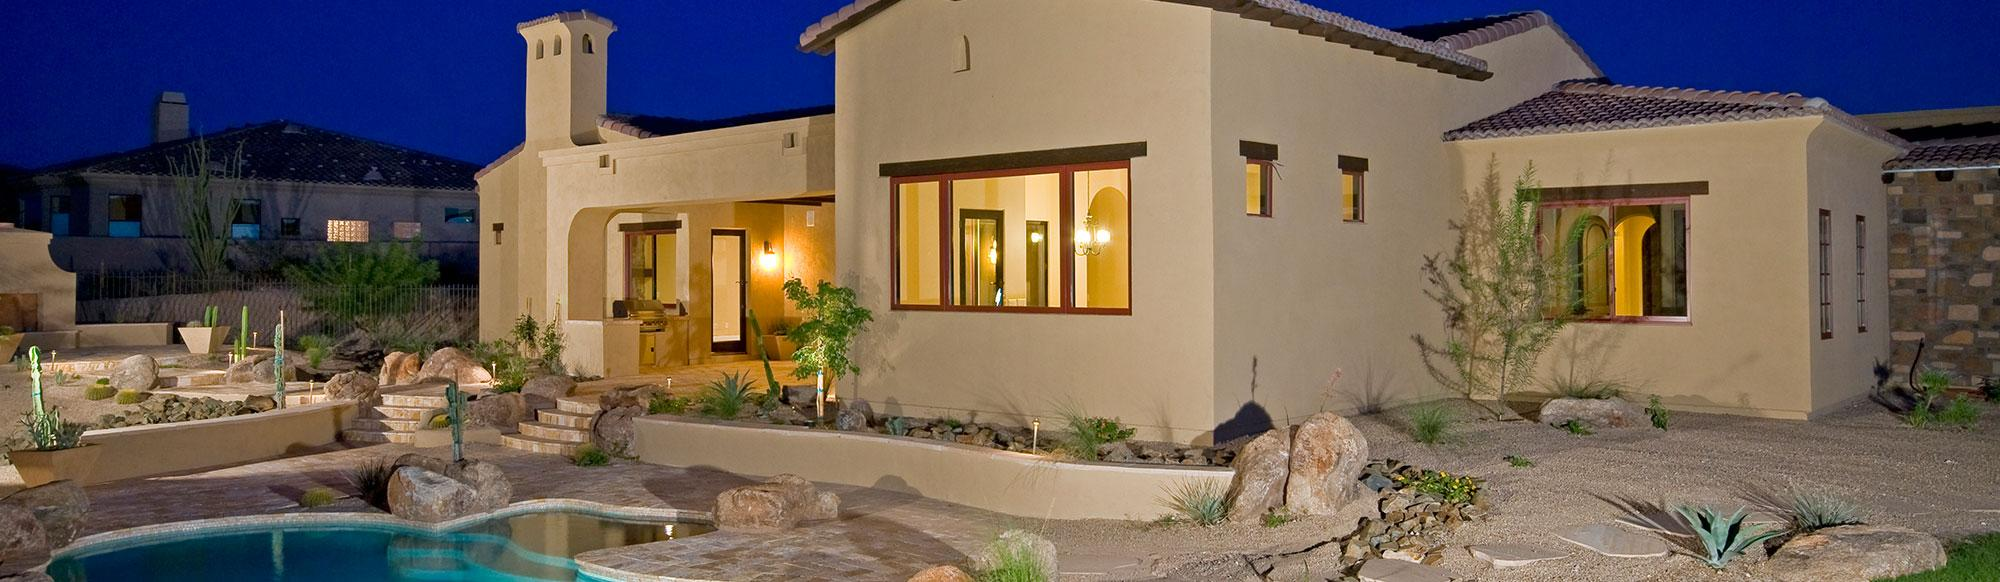 Planning a move to Buckeye, Arizona